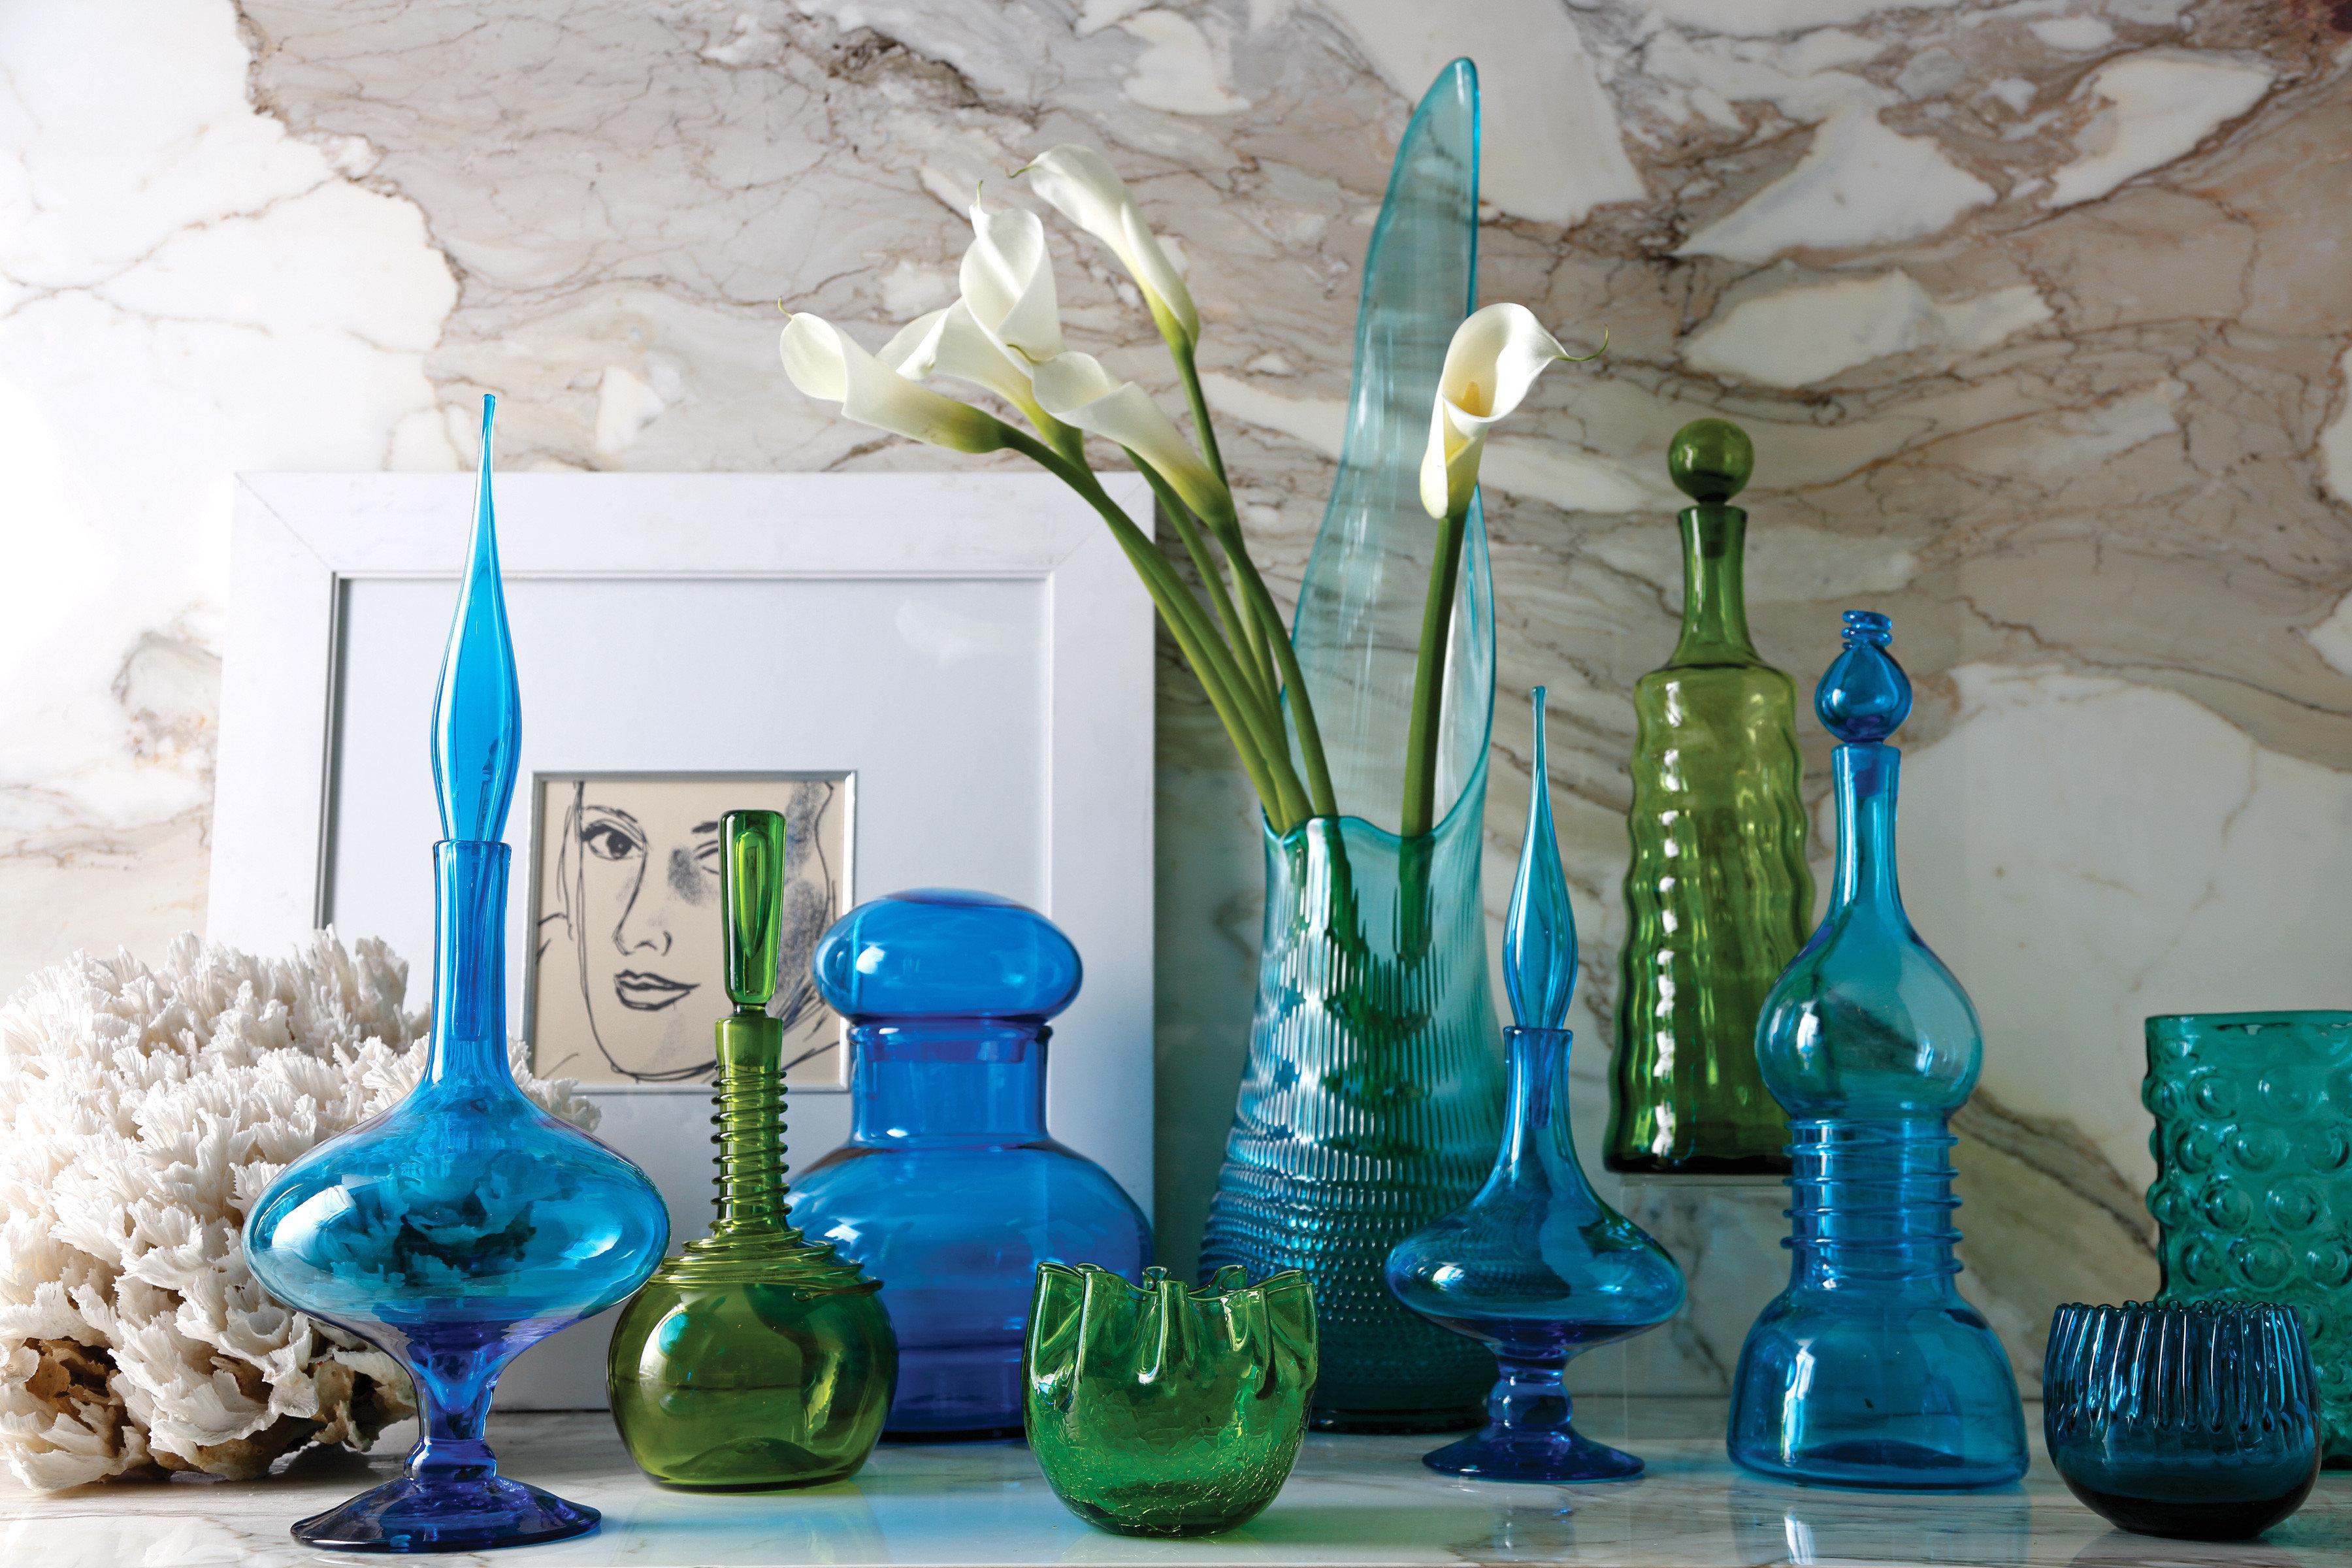 Boutique City Historic Lobby Lounge blue lighting glass bottle vase still life